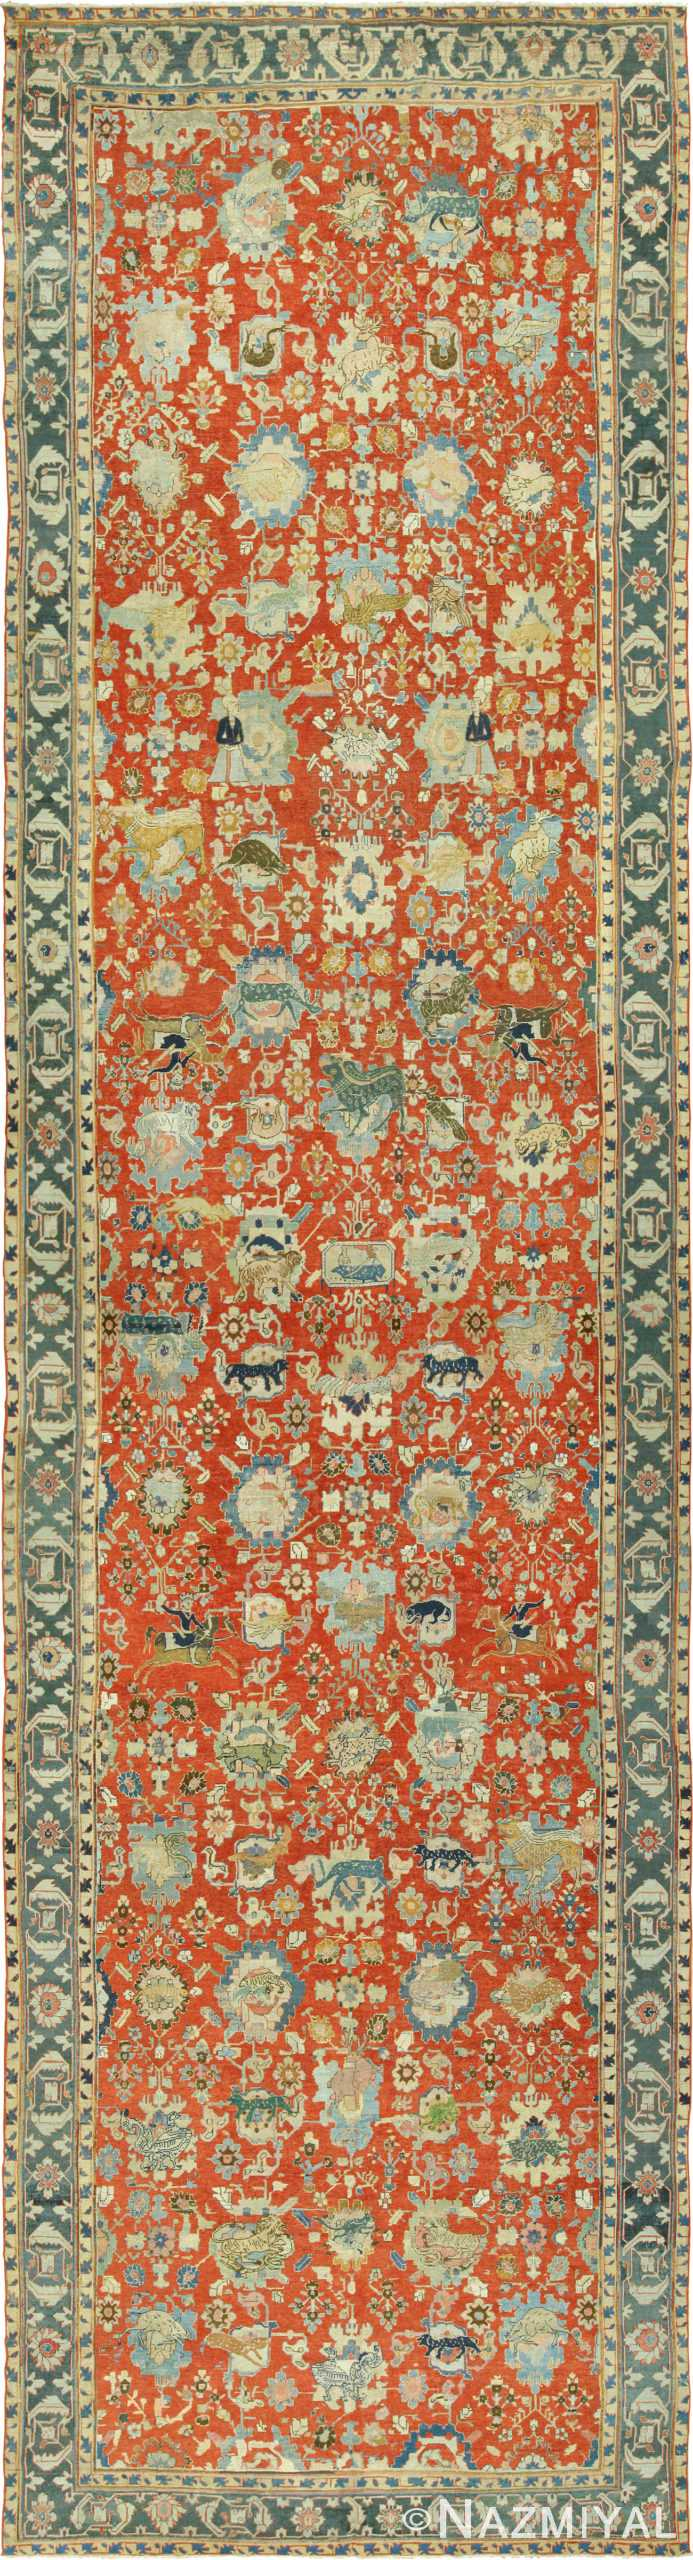 17th century hunting scene oversize Persian Isfahan Rug 3025 Nazmiyal